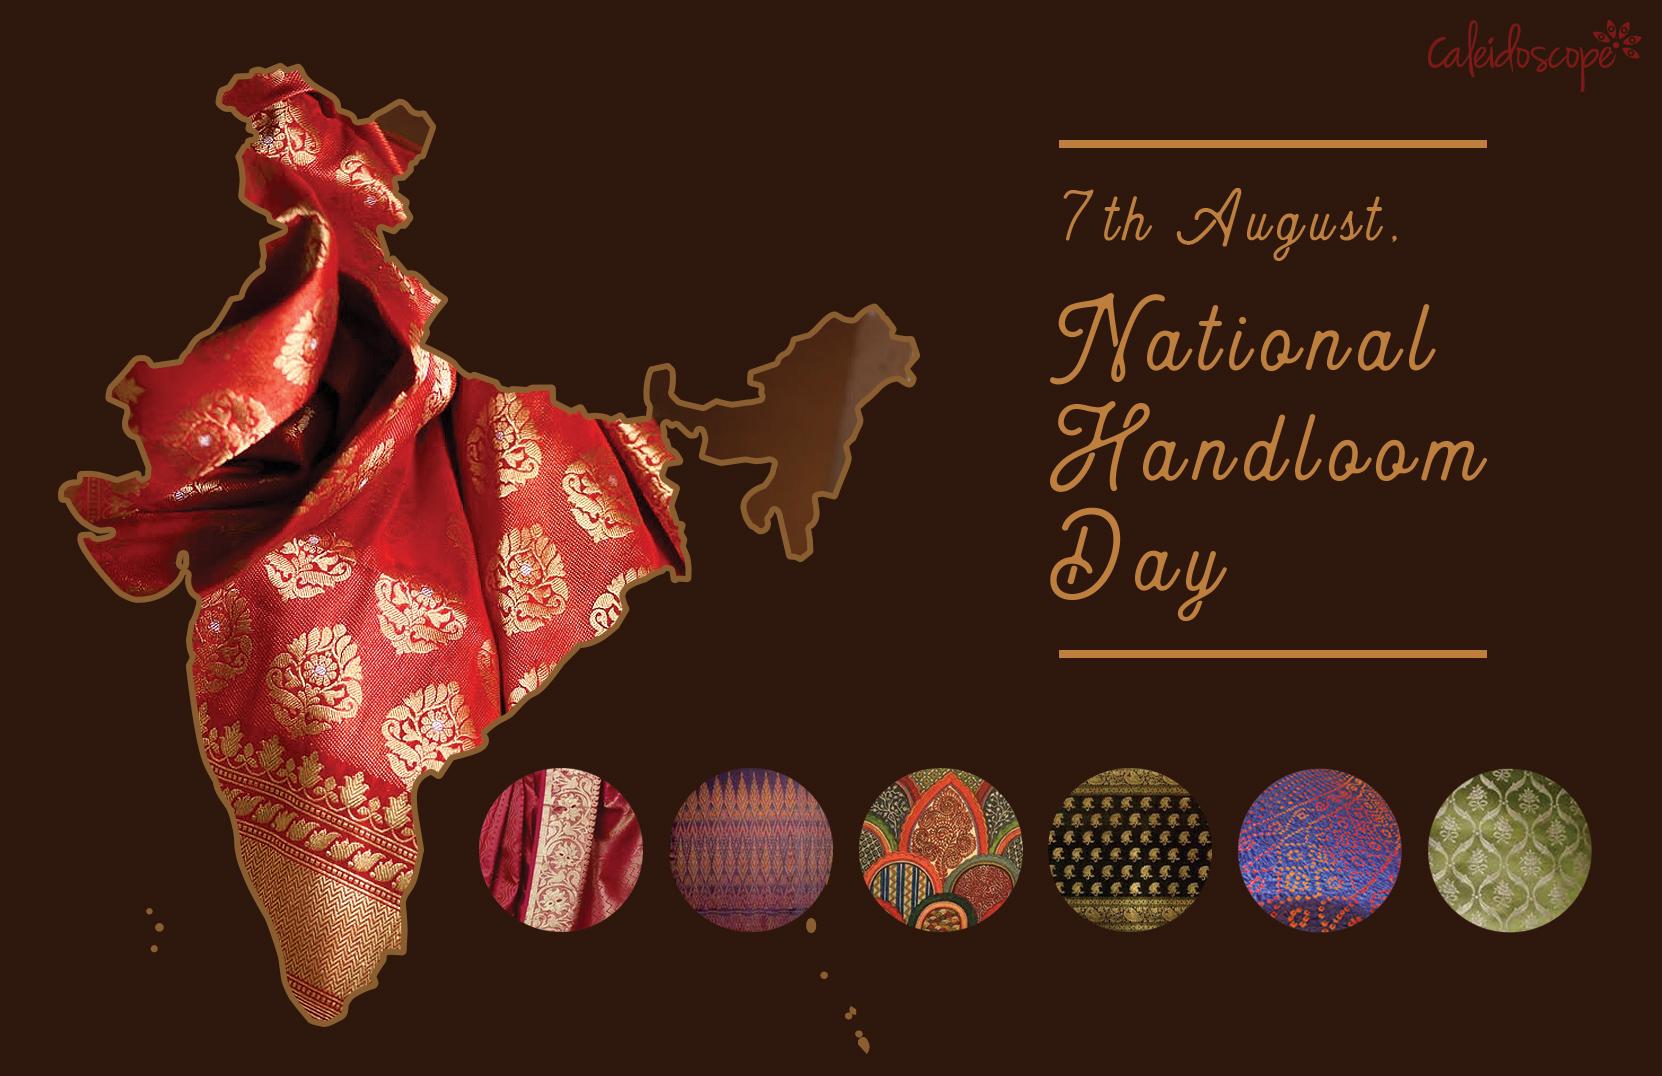 National-Handloom-Day